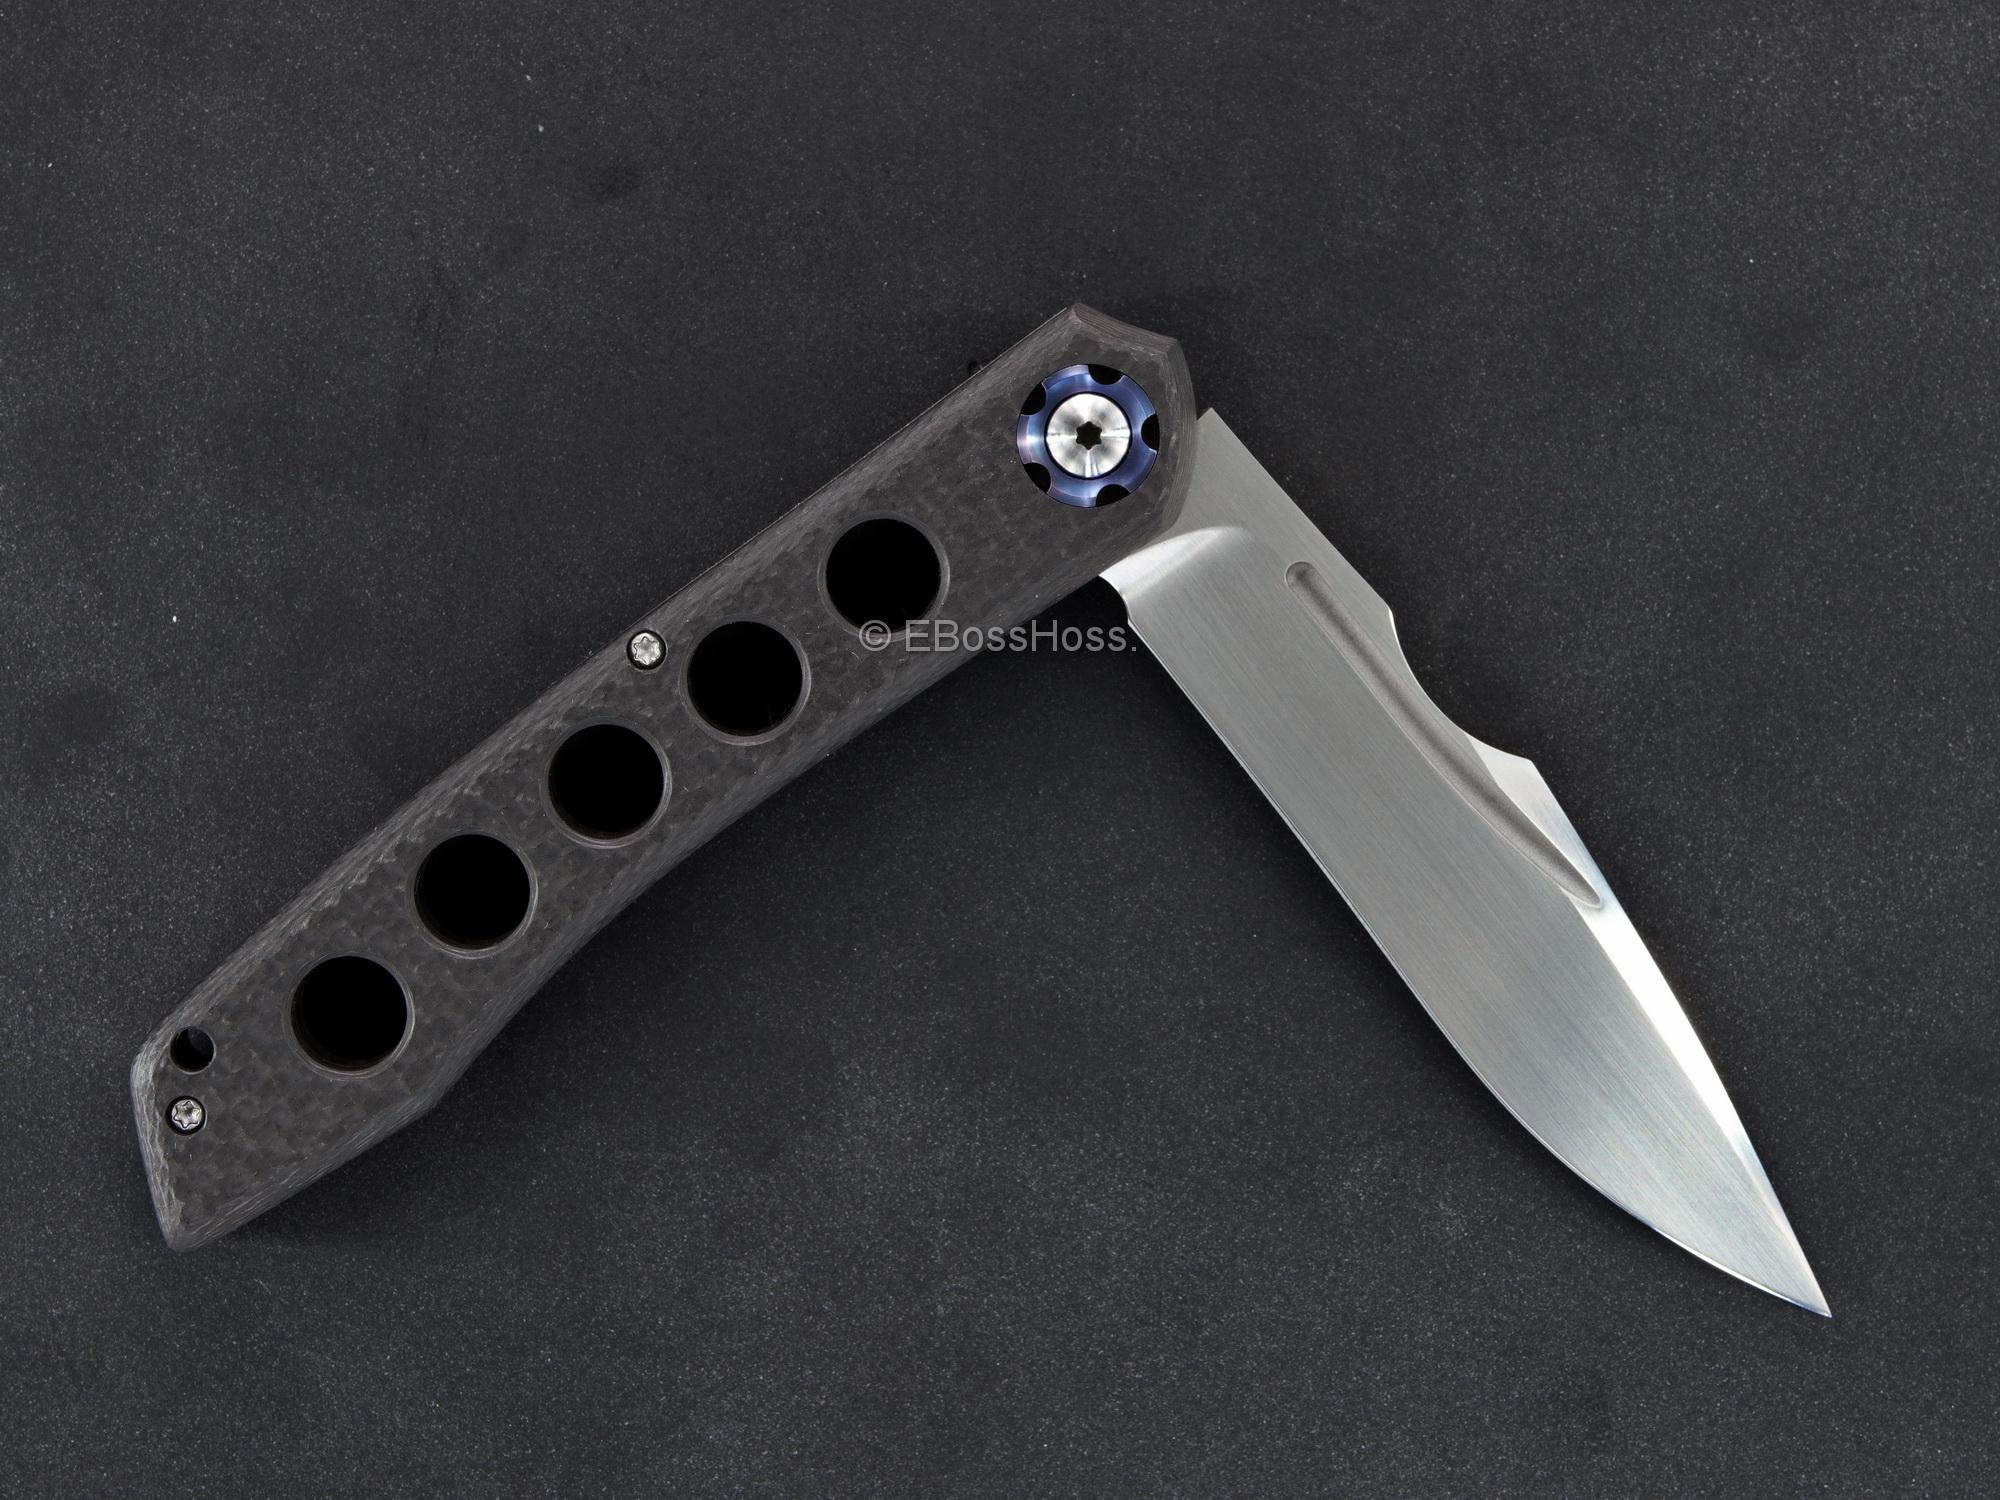 Gerry McGinnis - Michael Burch Custom Collaboration Slipjoint Knife